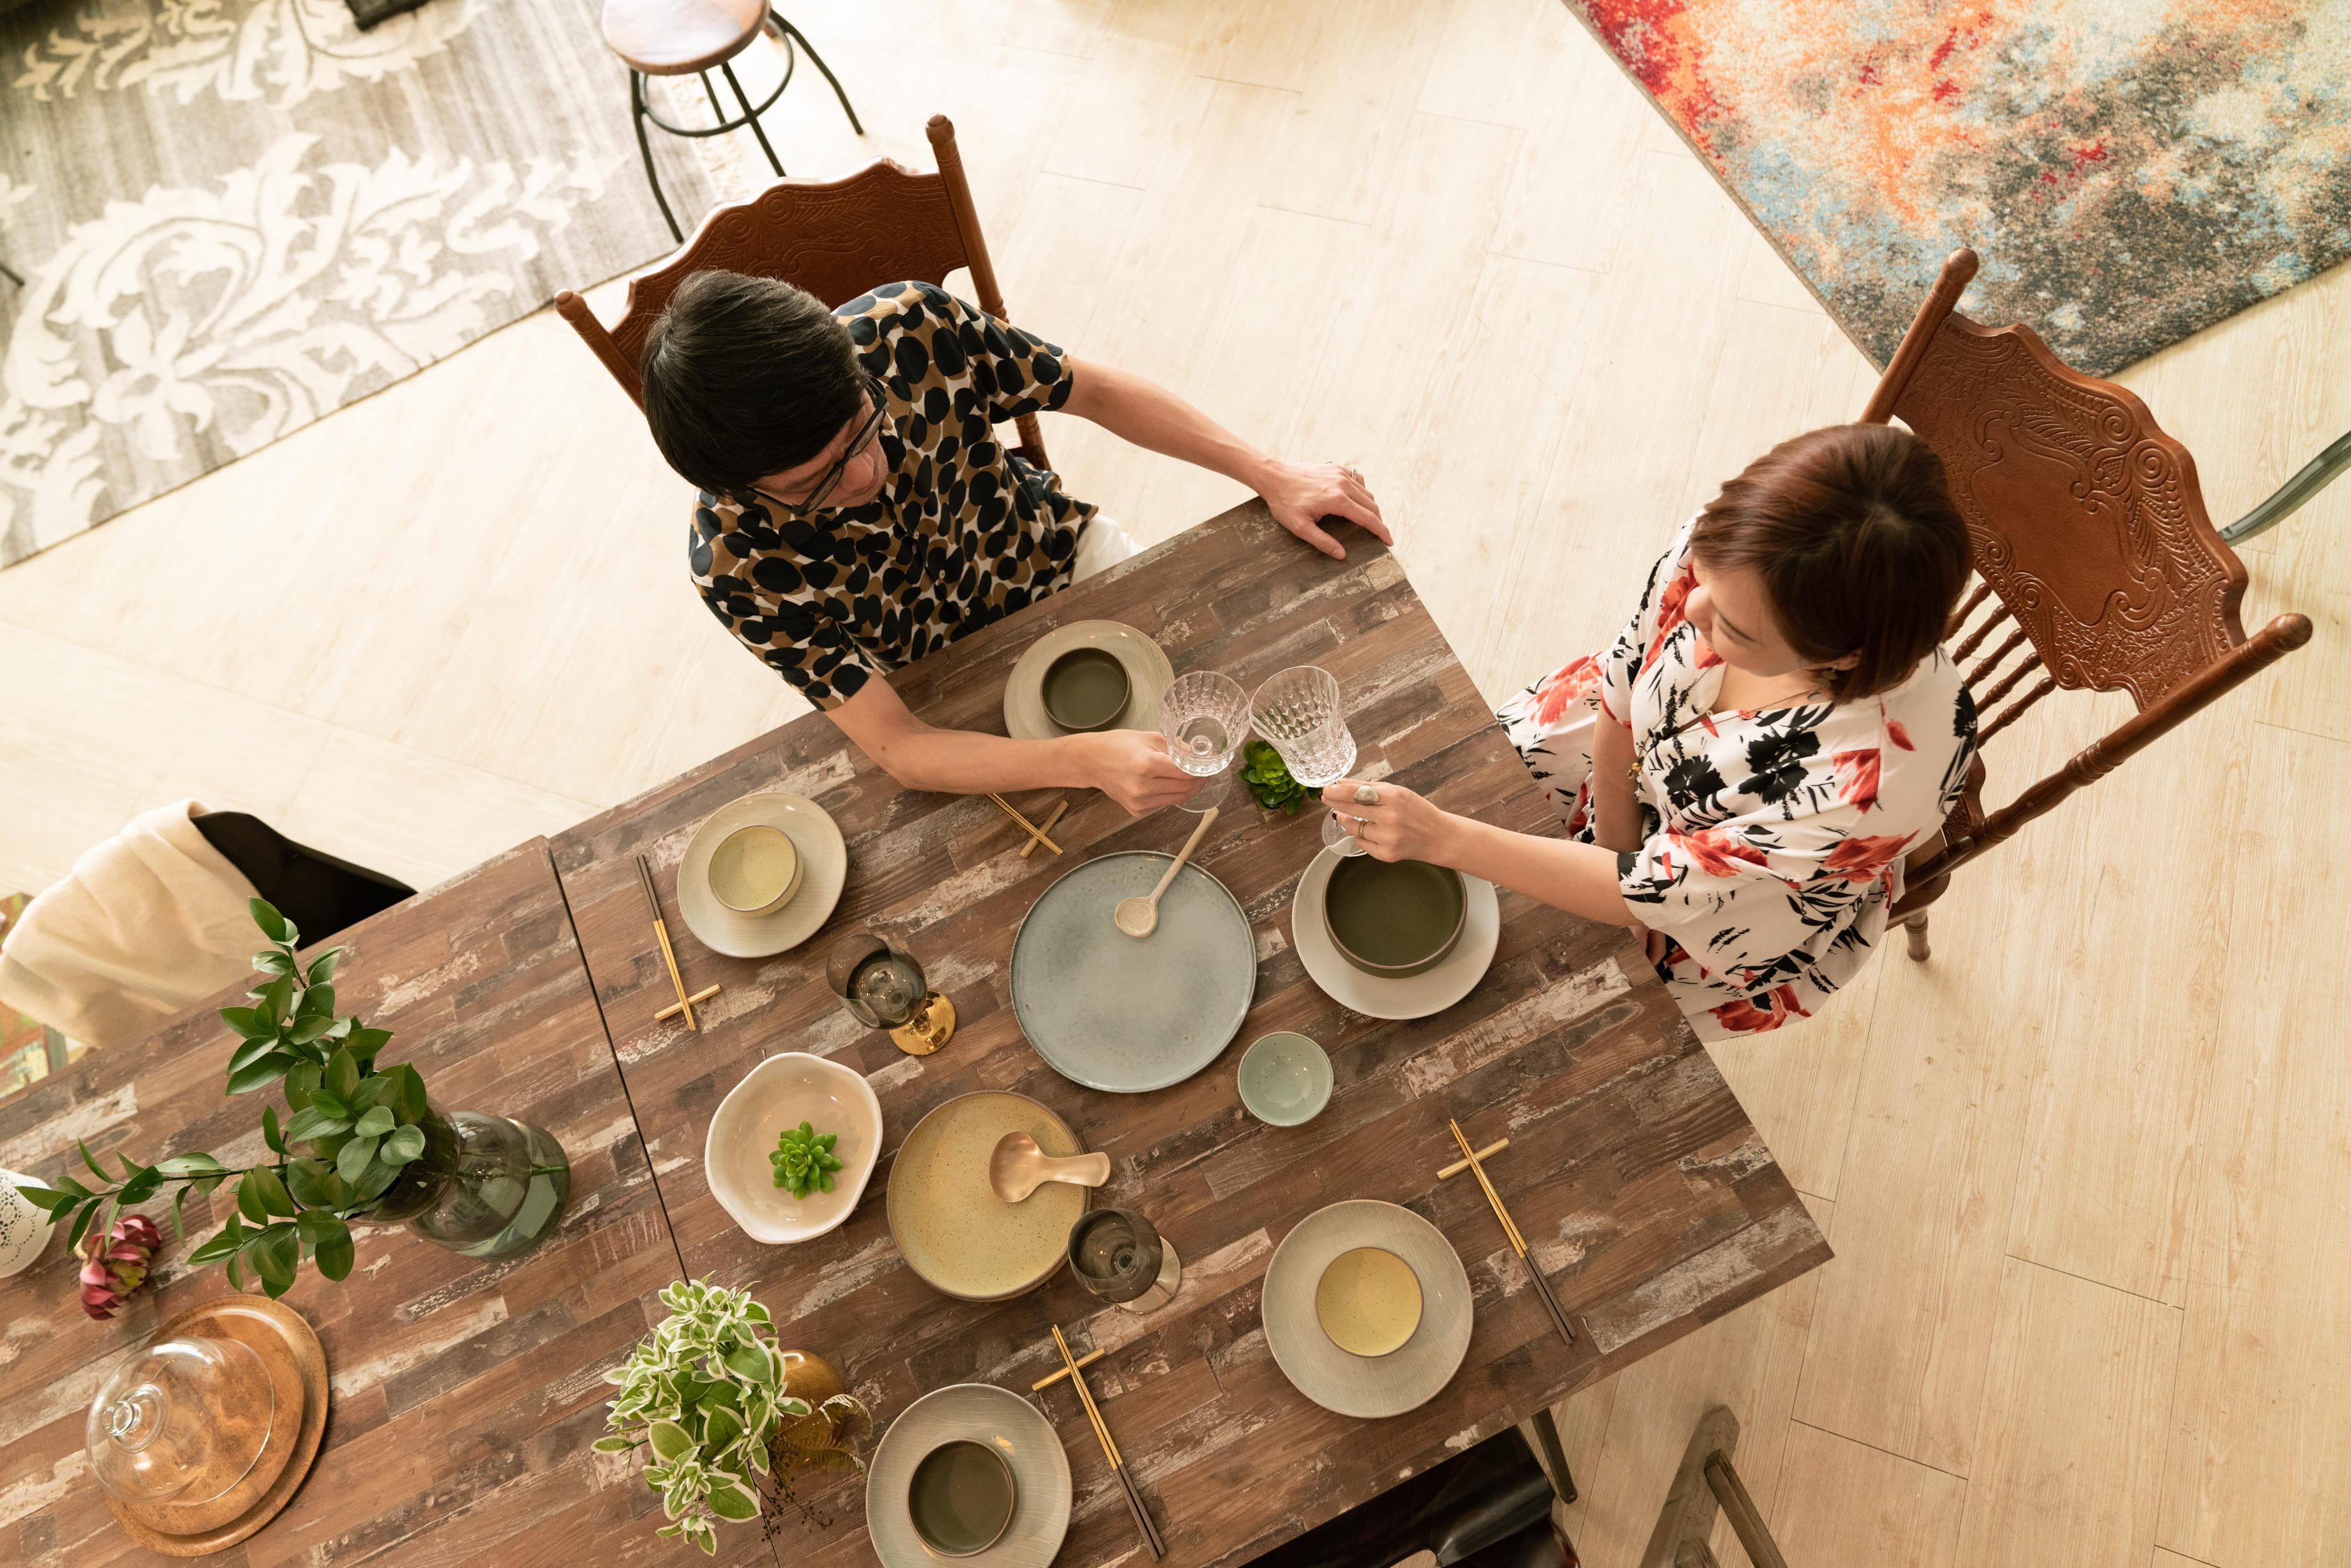 WAGA 餐桌藝術與花藝的搭配